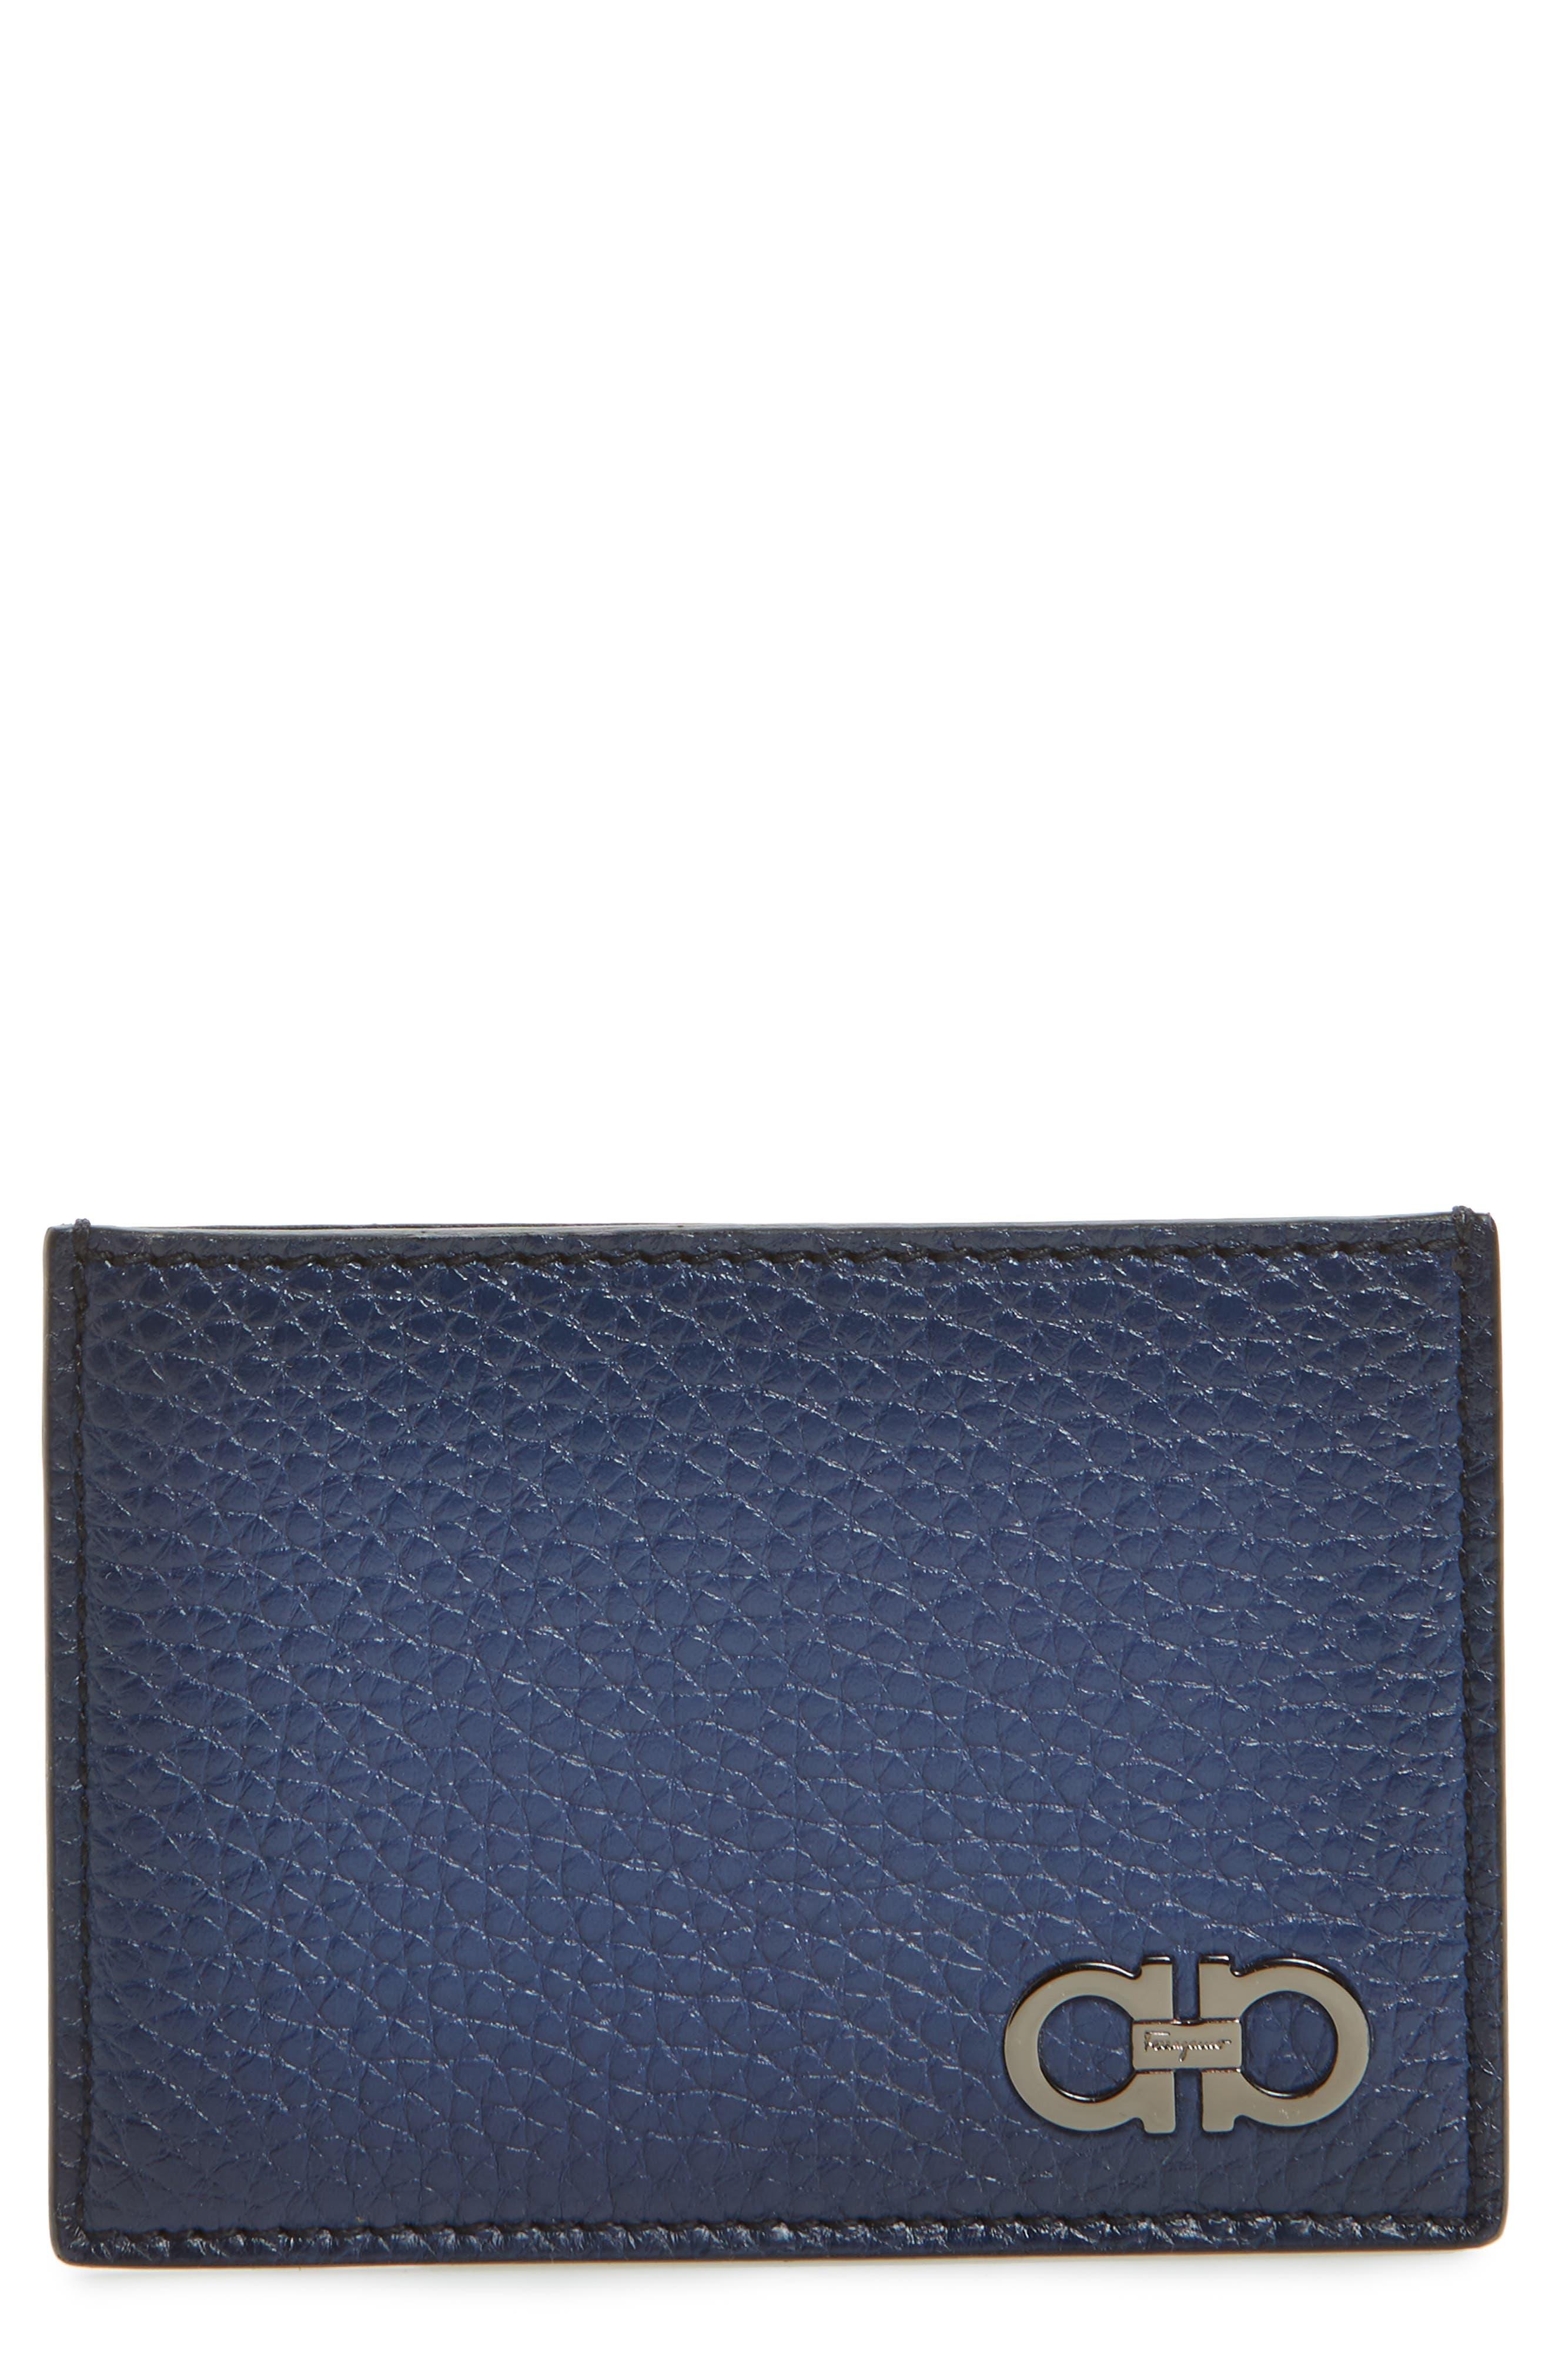 Revival Leather Card Case,                             Main thumbnail 1, color,                             Blue